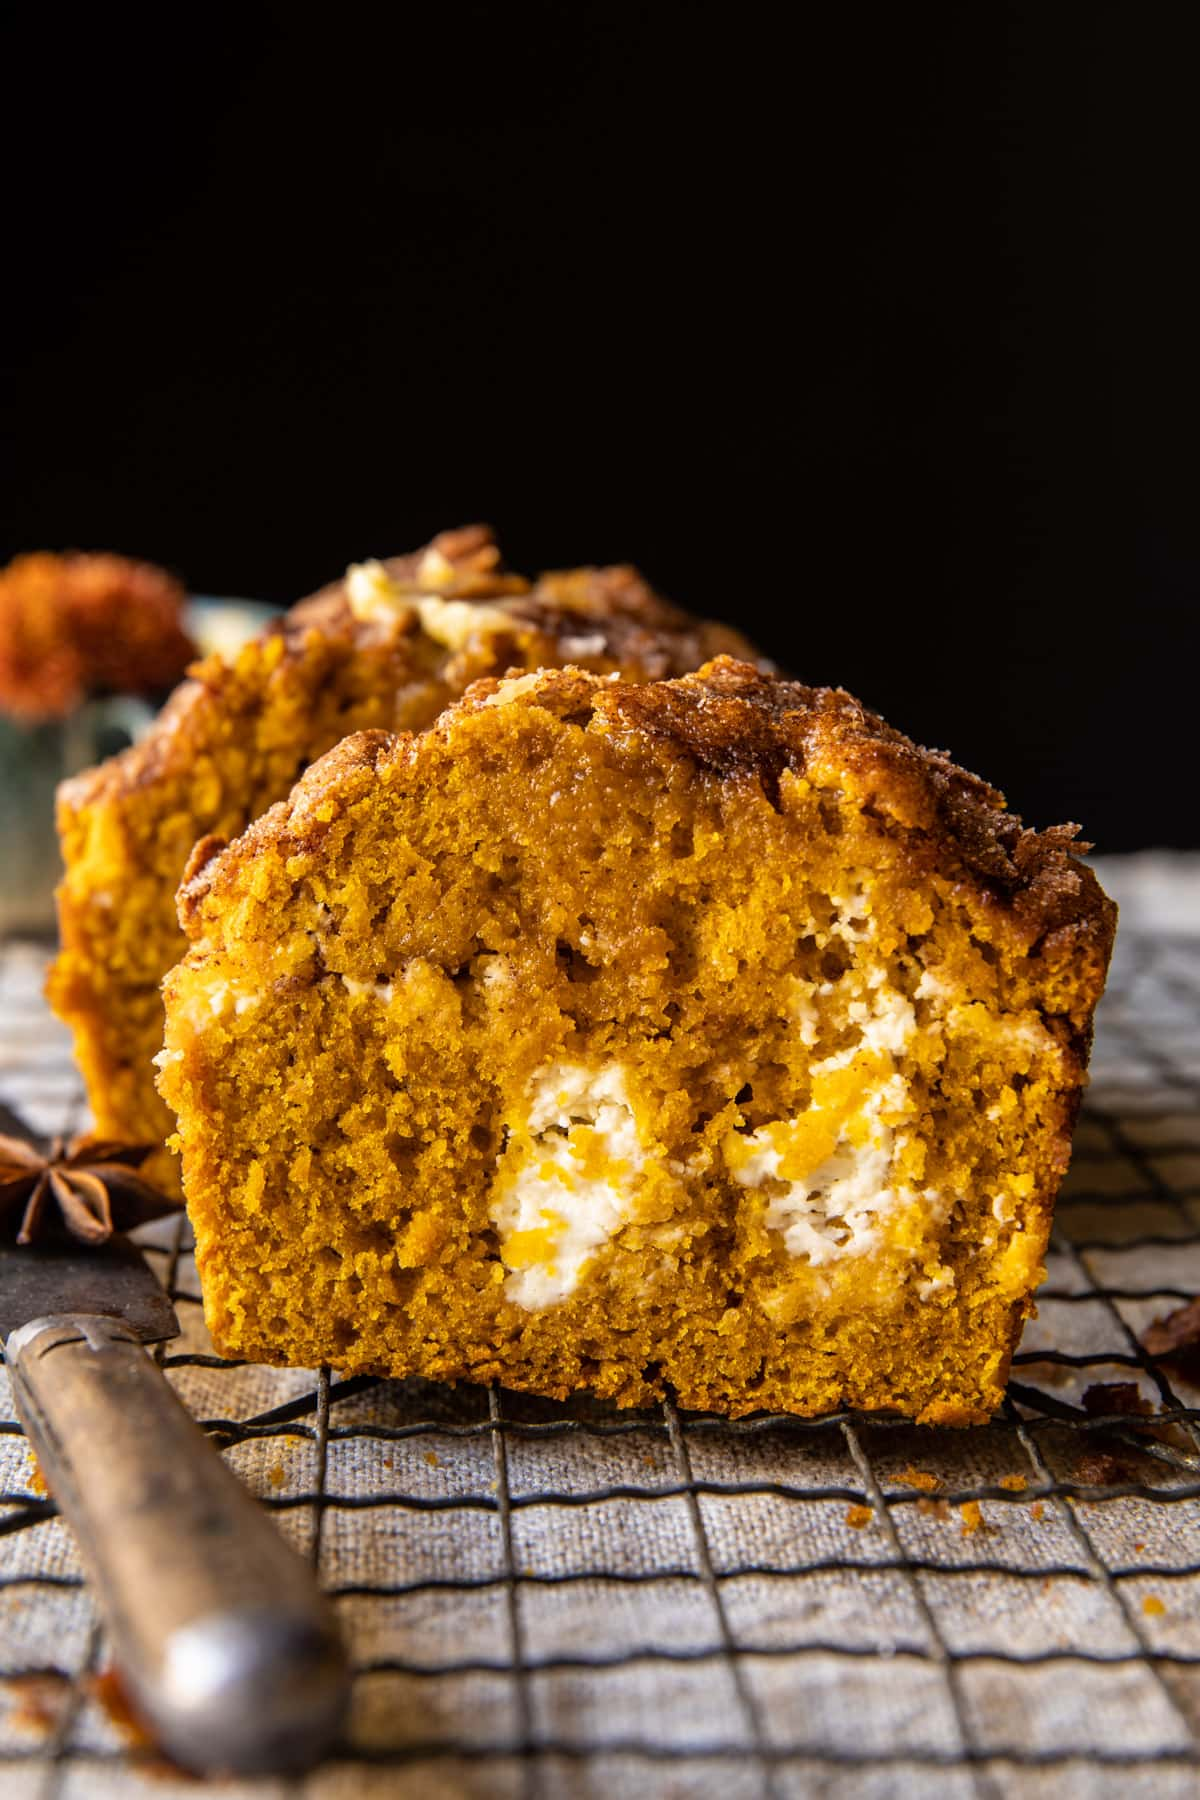 Cream Cheese Swirled Cinnamon Pumpkin Butter Bread | halfbakedharvest.com